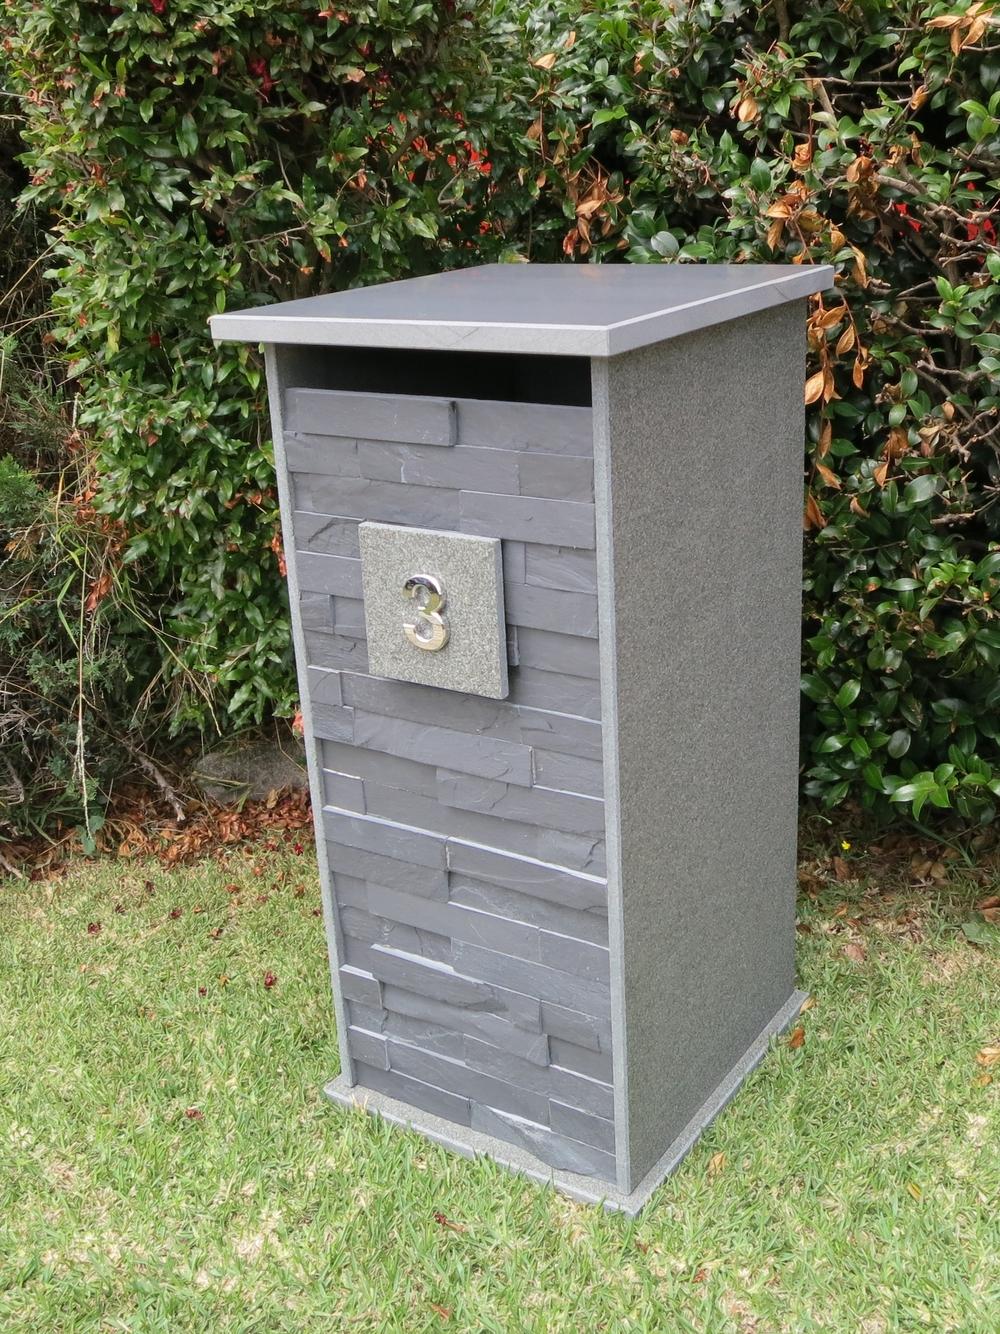 360 Bluestone letterbox 860 mm high $685.JPG